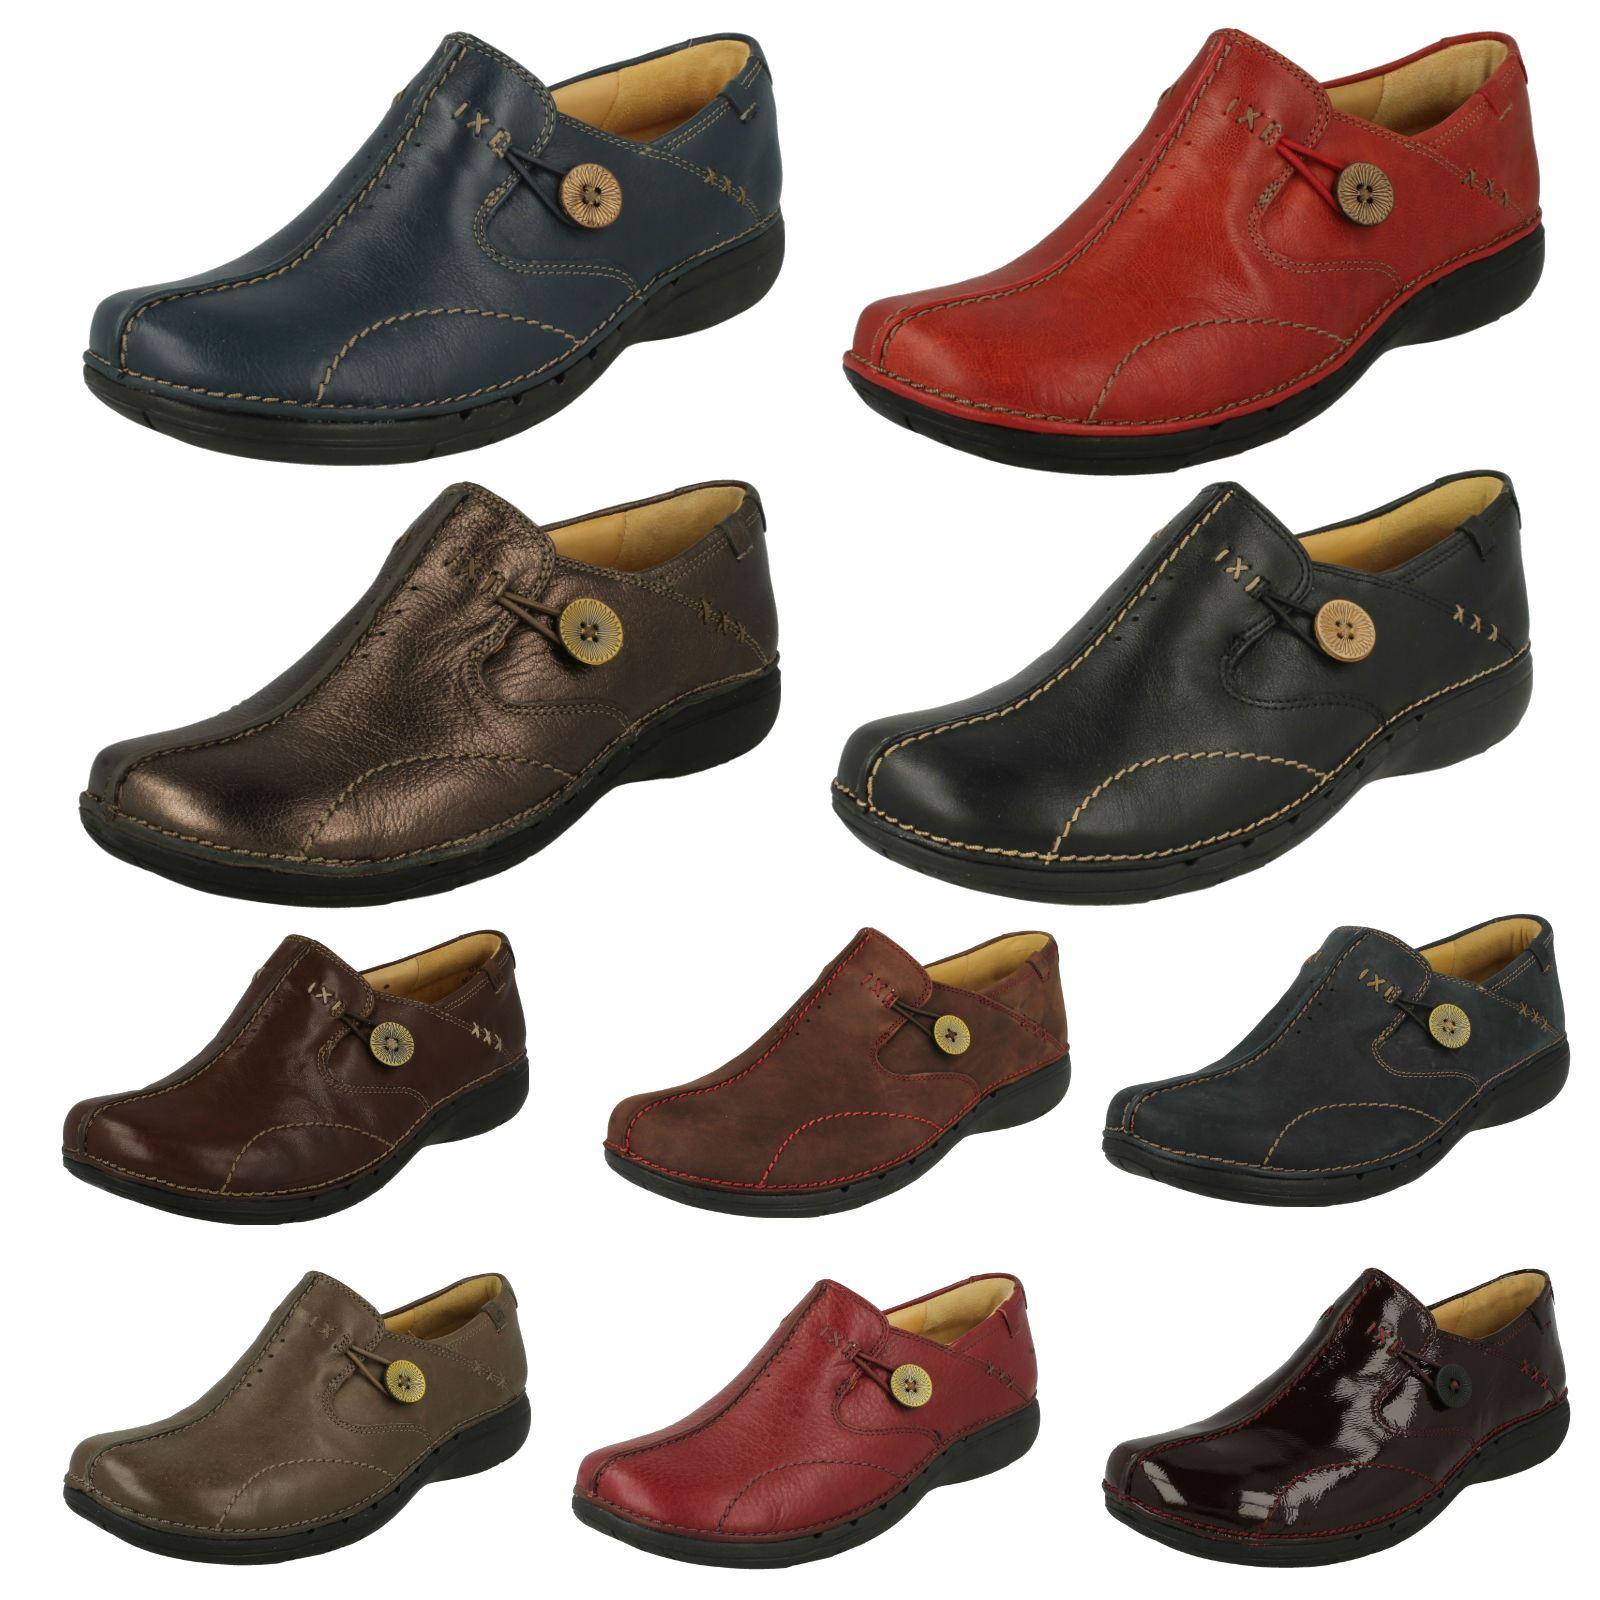 Details about Womens Clarks Un Structured Slip On Shoes Un Loop